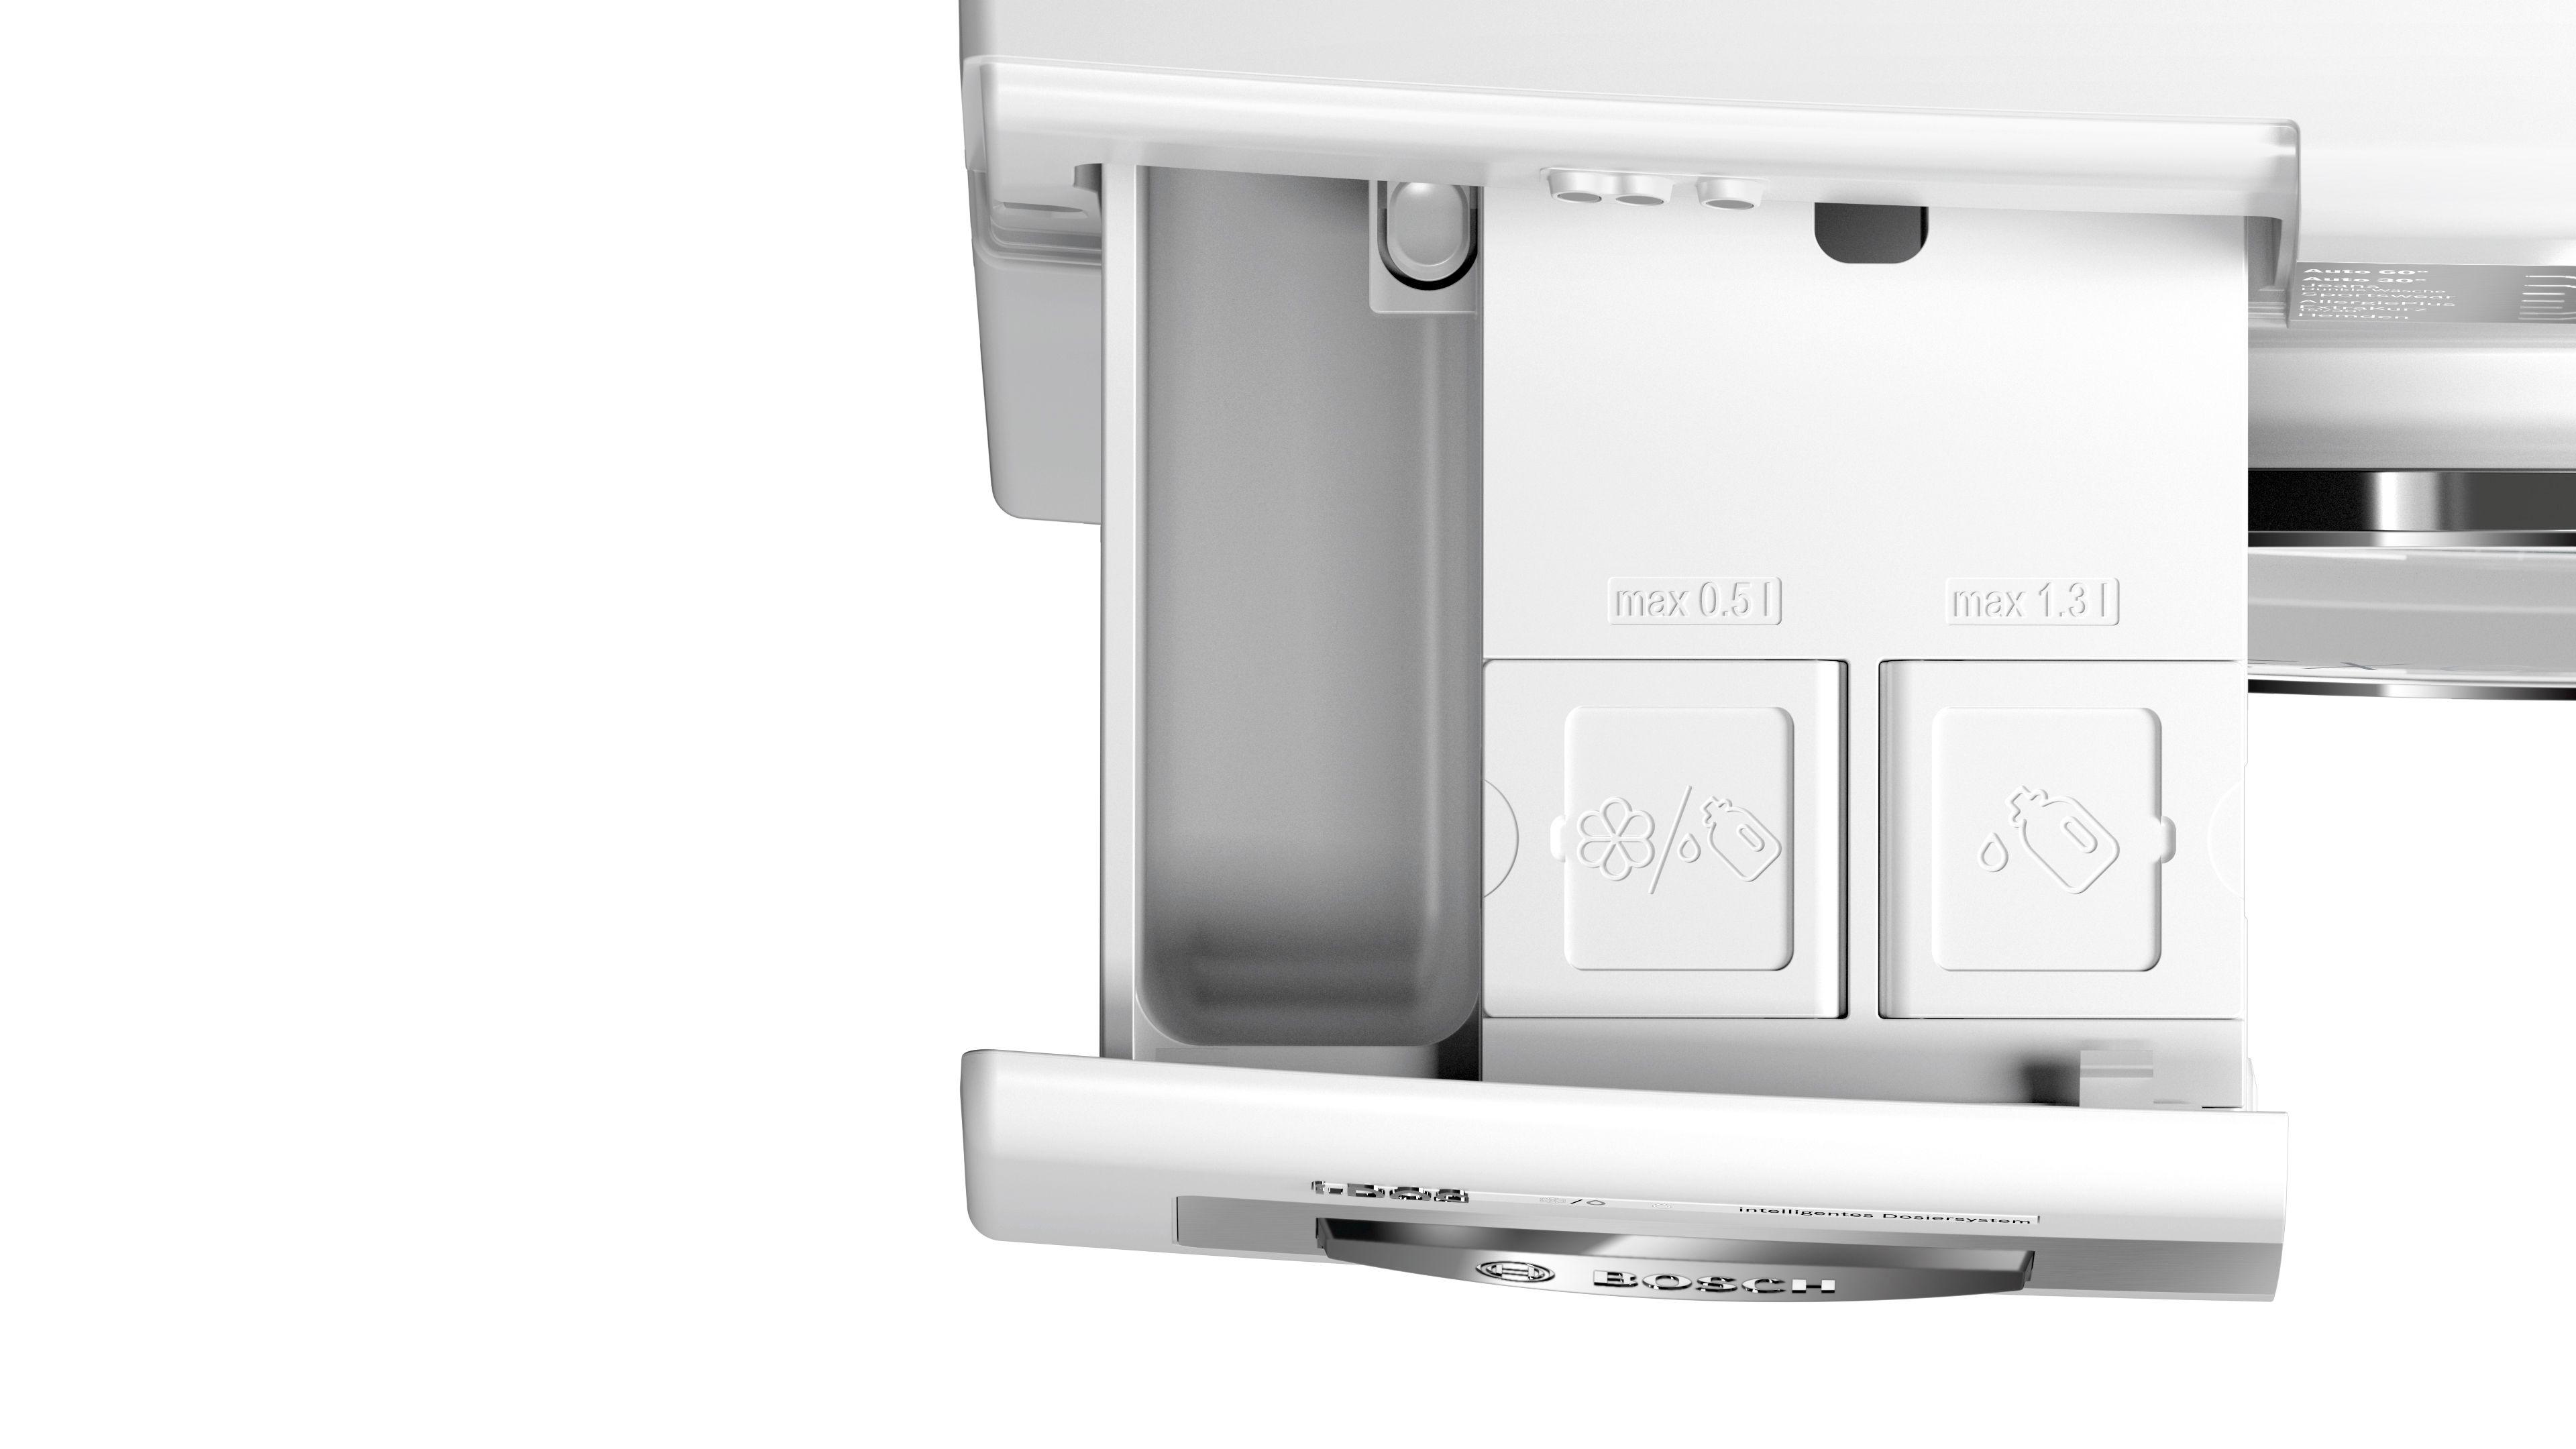 HomeProfessional Mašina za pranje veša, iDOS